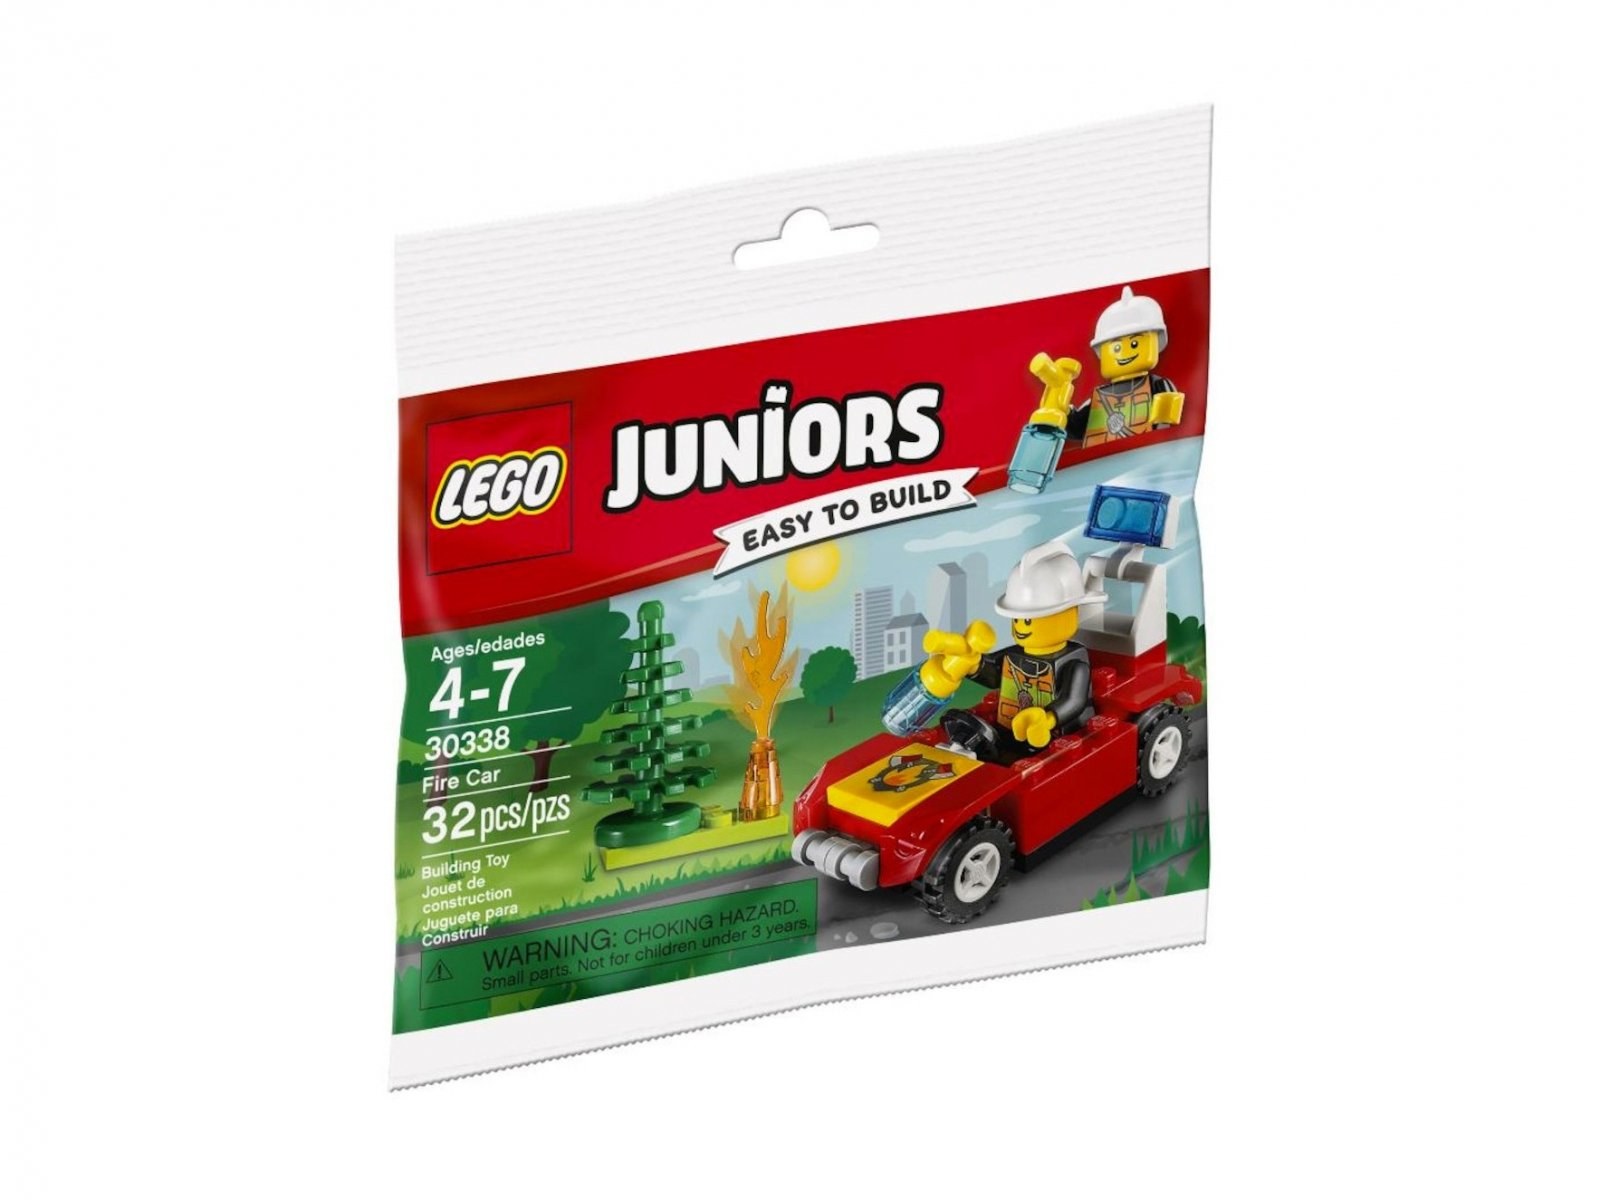 Lego 30338 Juniors Samochód Strażacki Zklockówpl